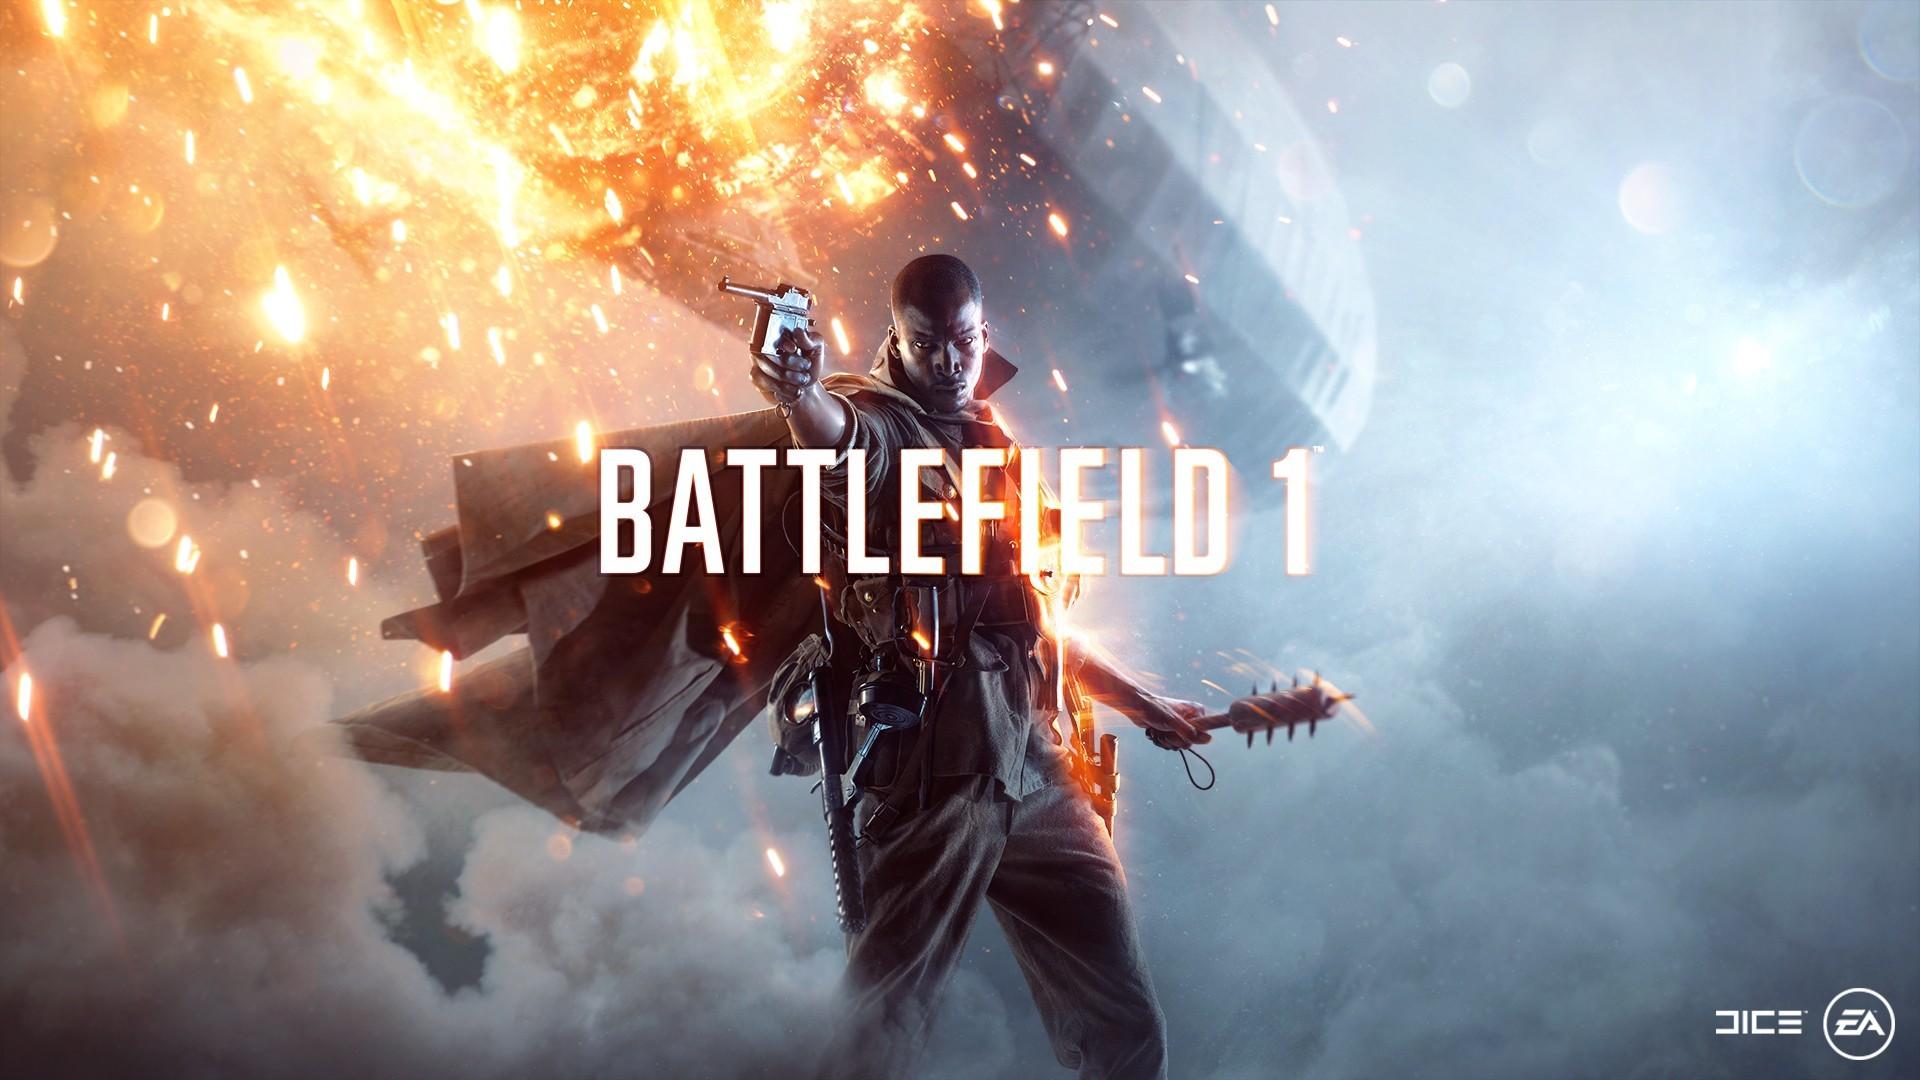 Battlefield 1, PC gaming Wallpaper HD